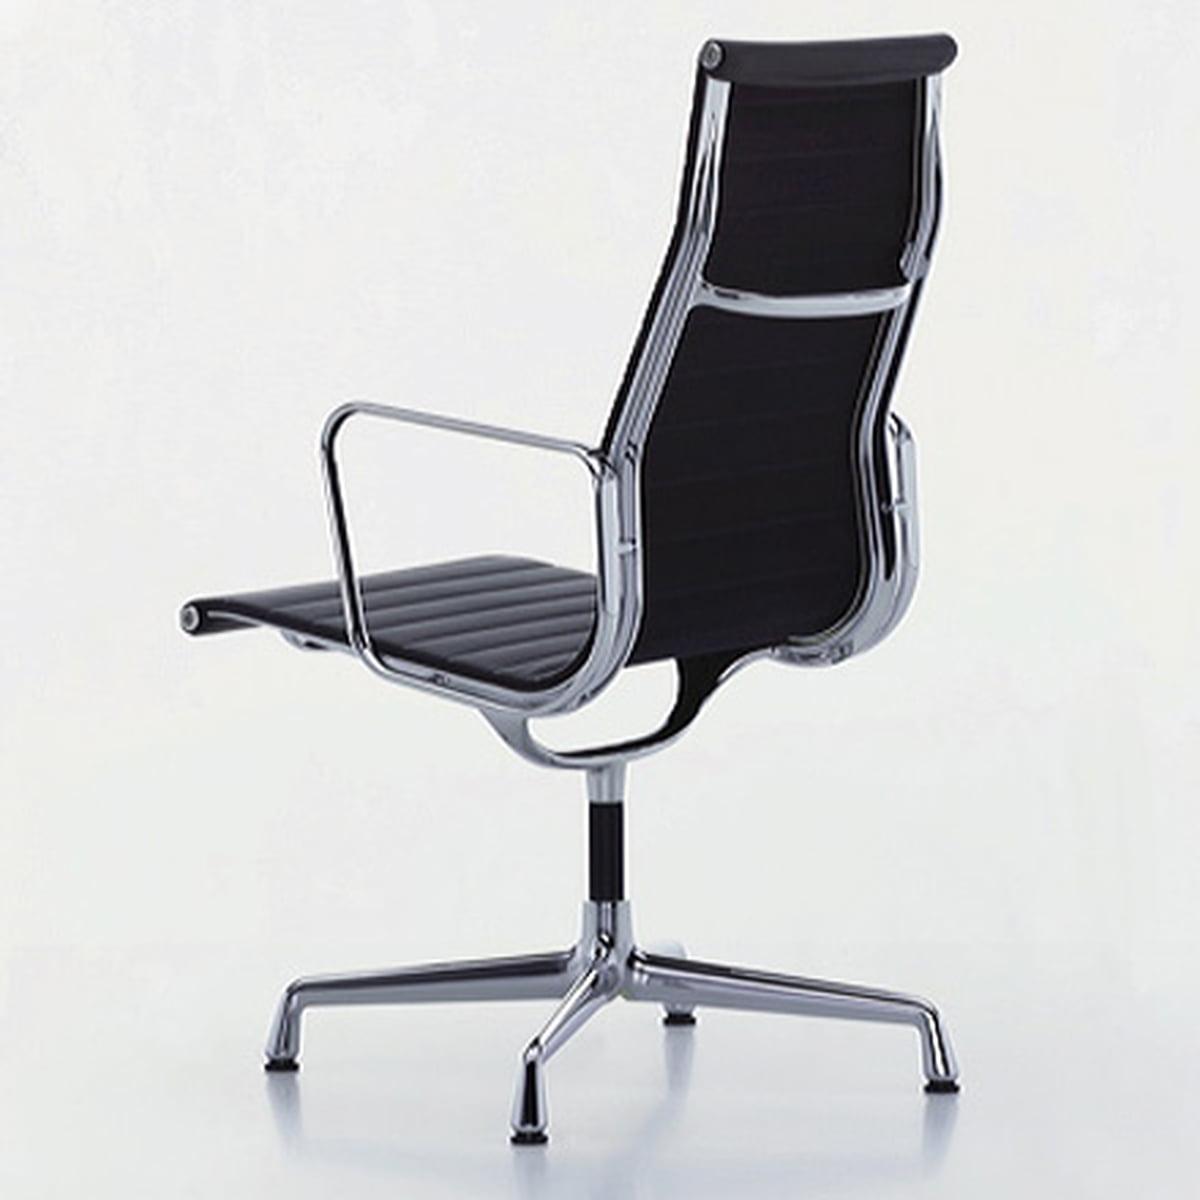 vitra aluminium group ea 116 chair. Black Bedroom Furniture Sets. Home Design Ideas